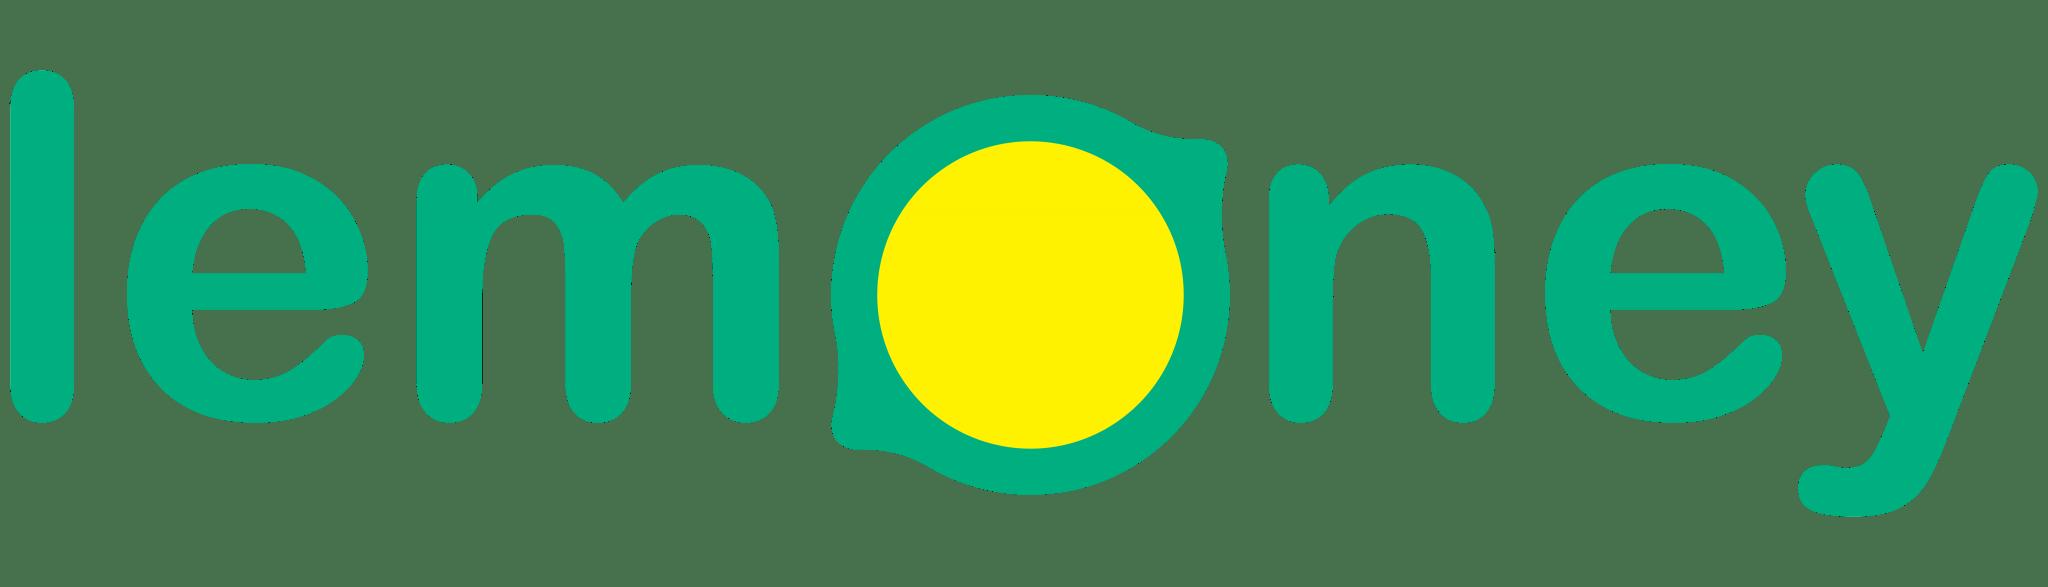 Is Lemoney Legit? (+ Lemoney Reviews)